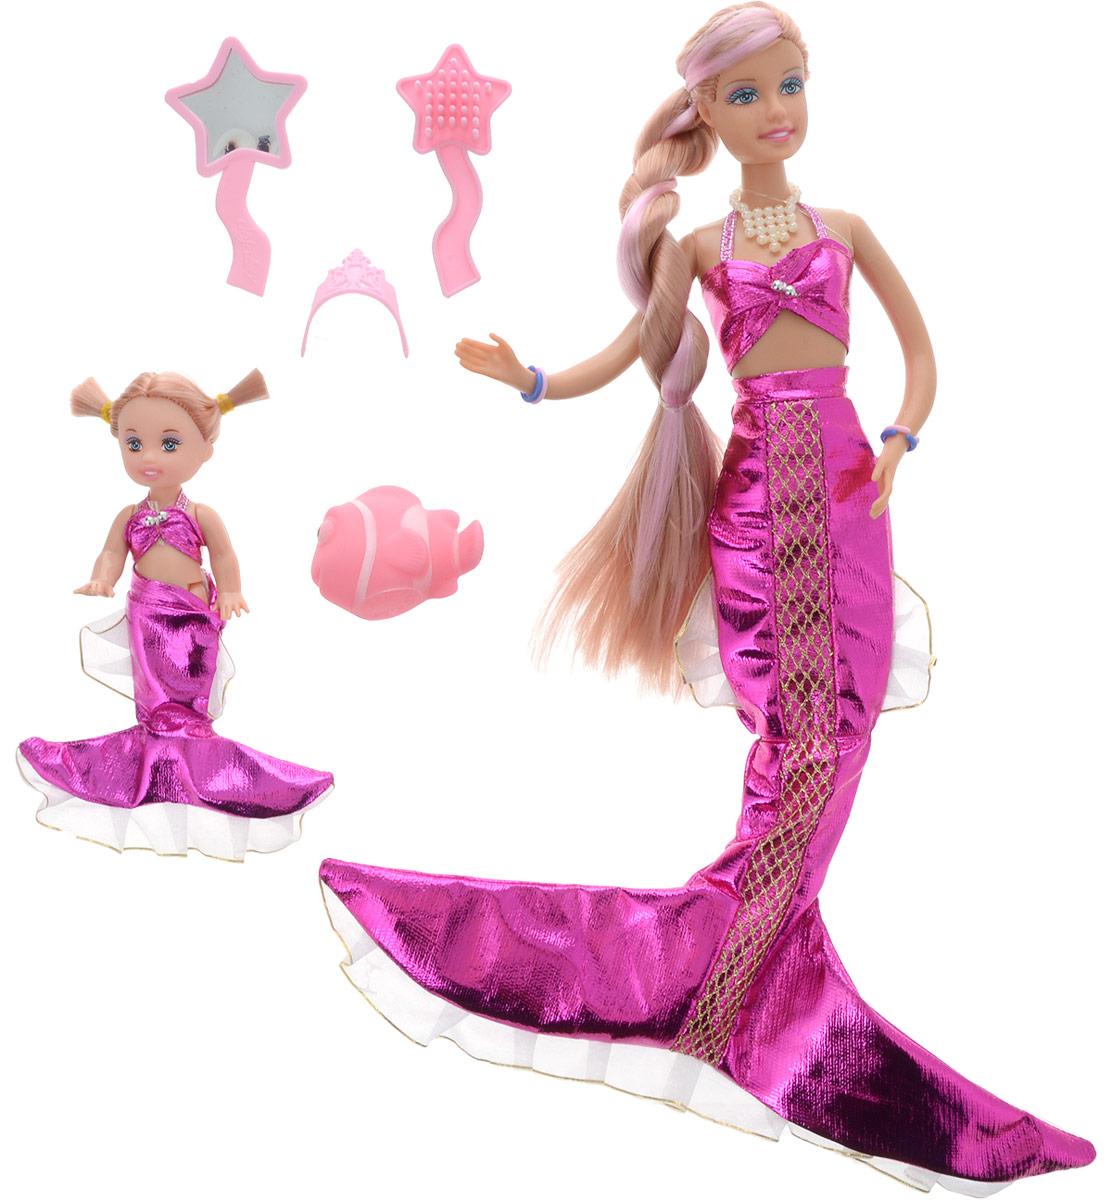 Кукла Defa Русалочка с ребенком и аксессуарами 34 см цвет розовый кукла defa lucy невеста 8341